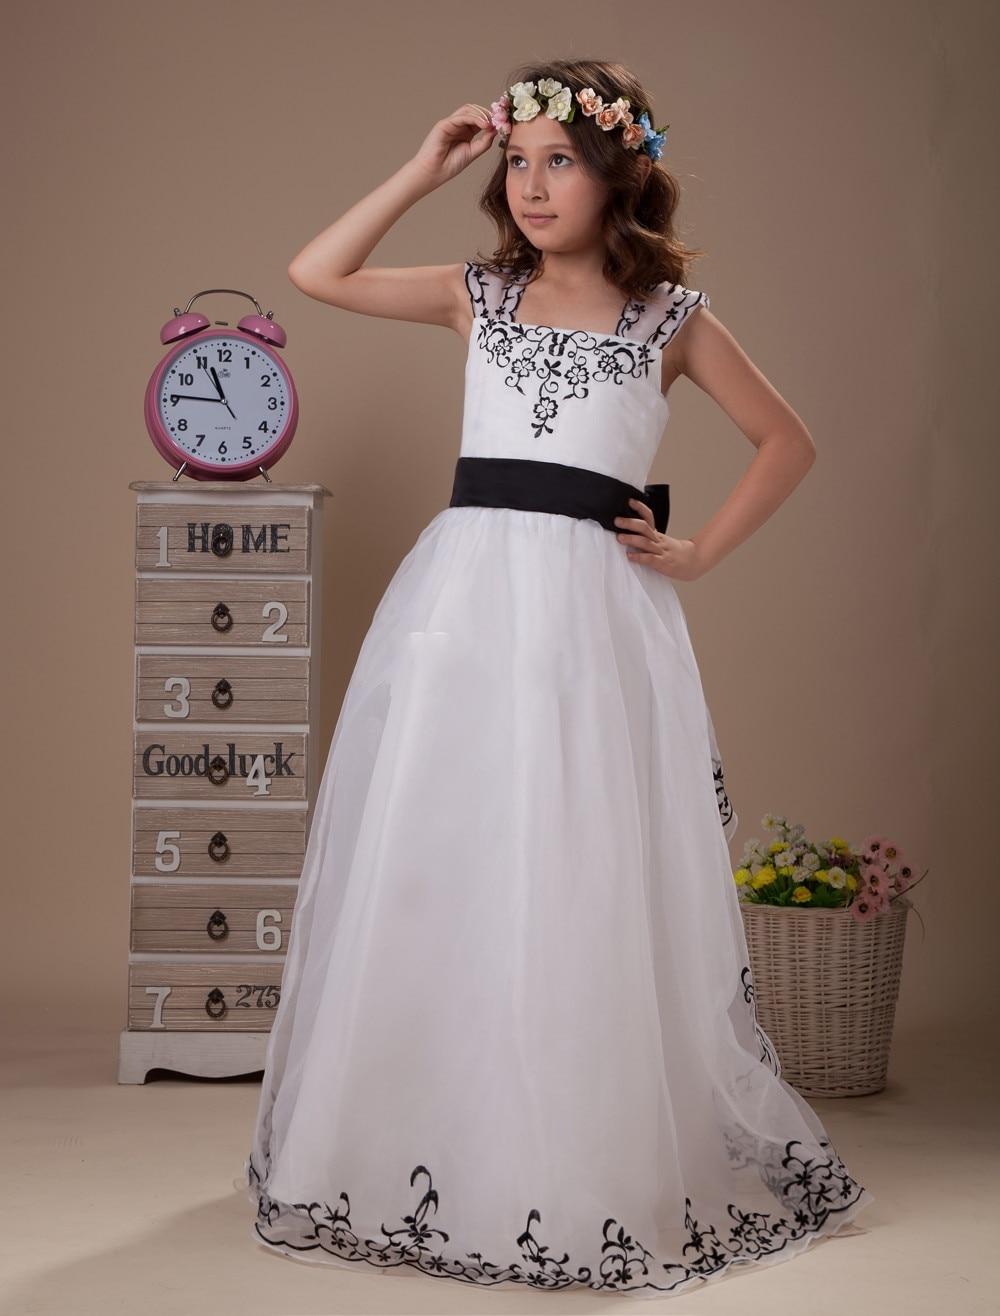 Black And White Flower Girl Dresses For Weddings Embroidery Girls